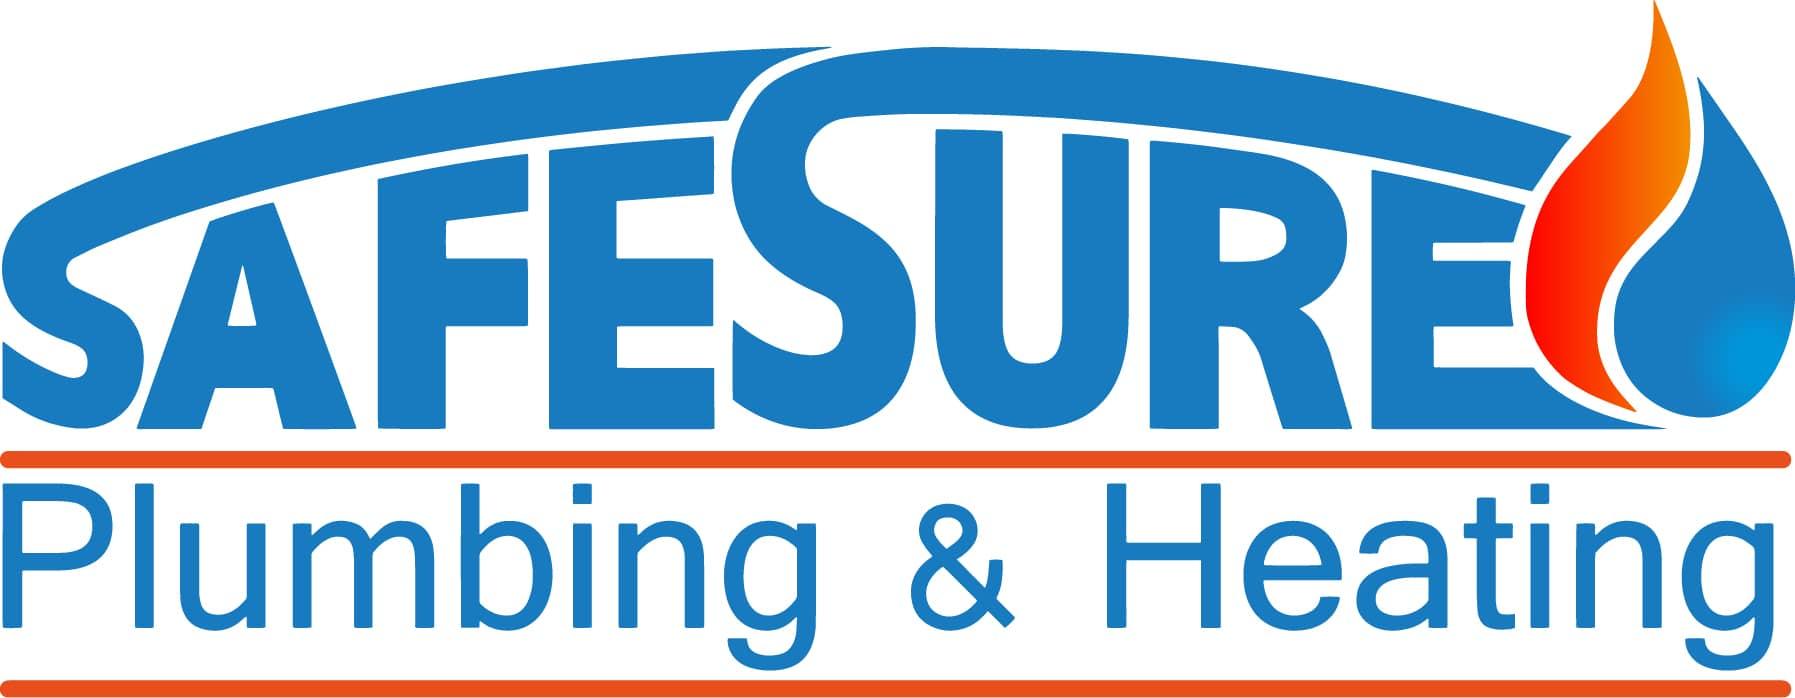 Safesure Plumbing and Heating